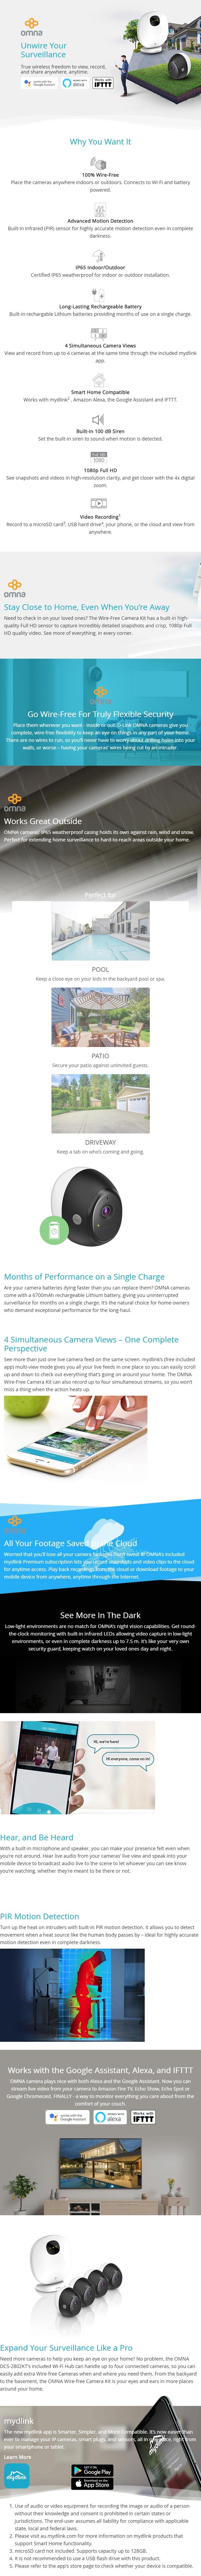 D-Link OMNA Wire-Free Indoor/Outdoor Camera Kit